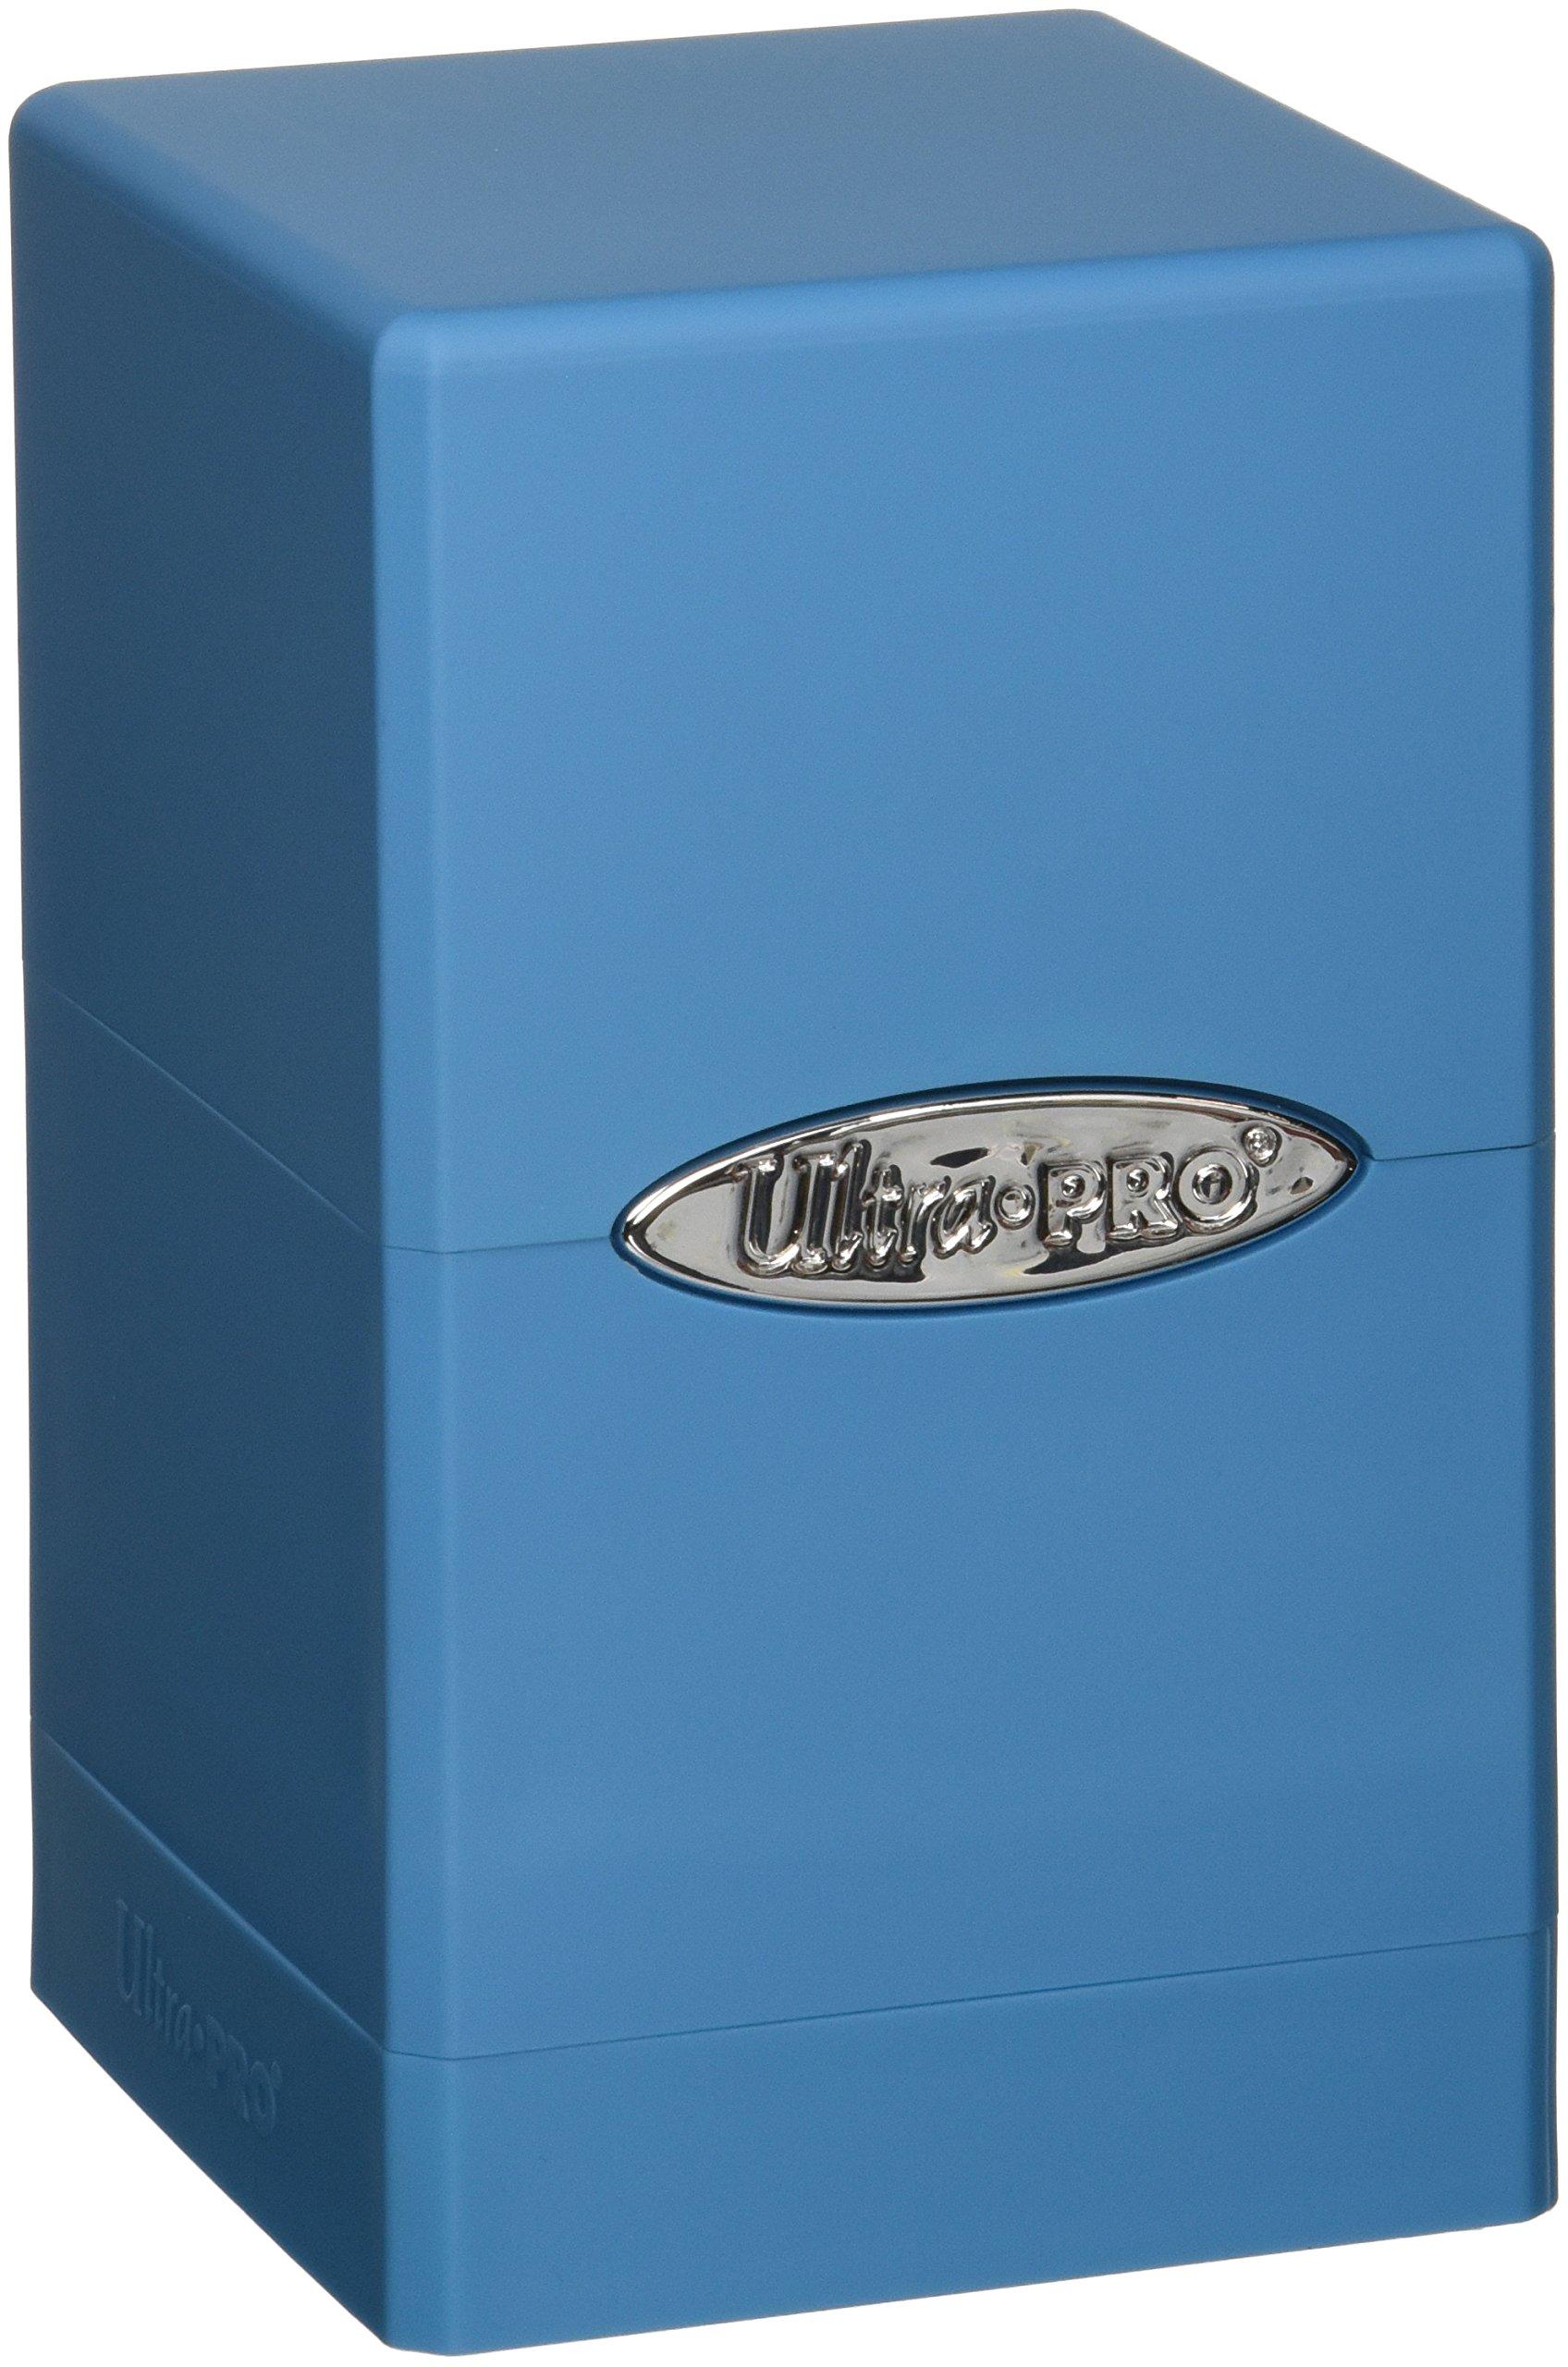 Ultra Pro Light Blue Satin Tower Deck Boxes by Ultra Pro